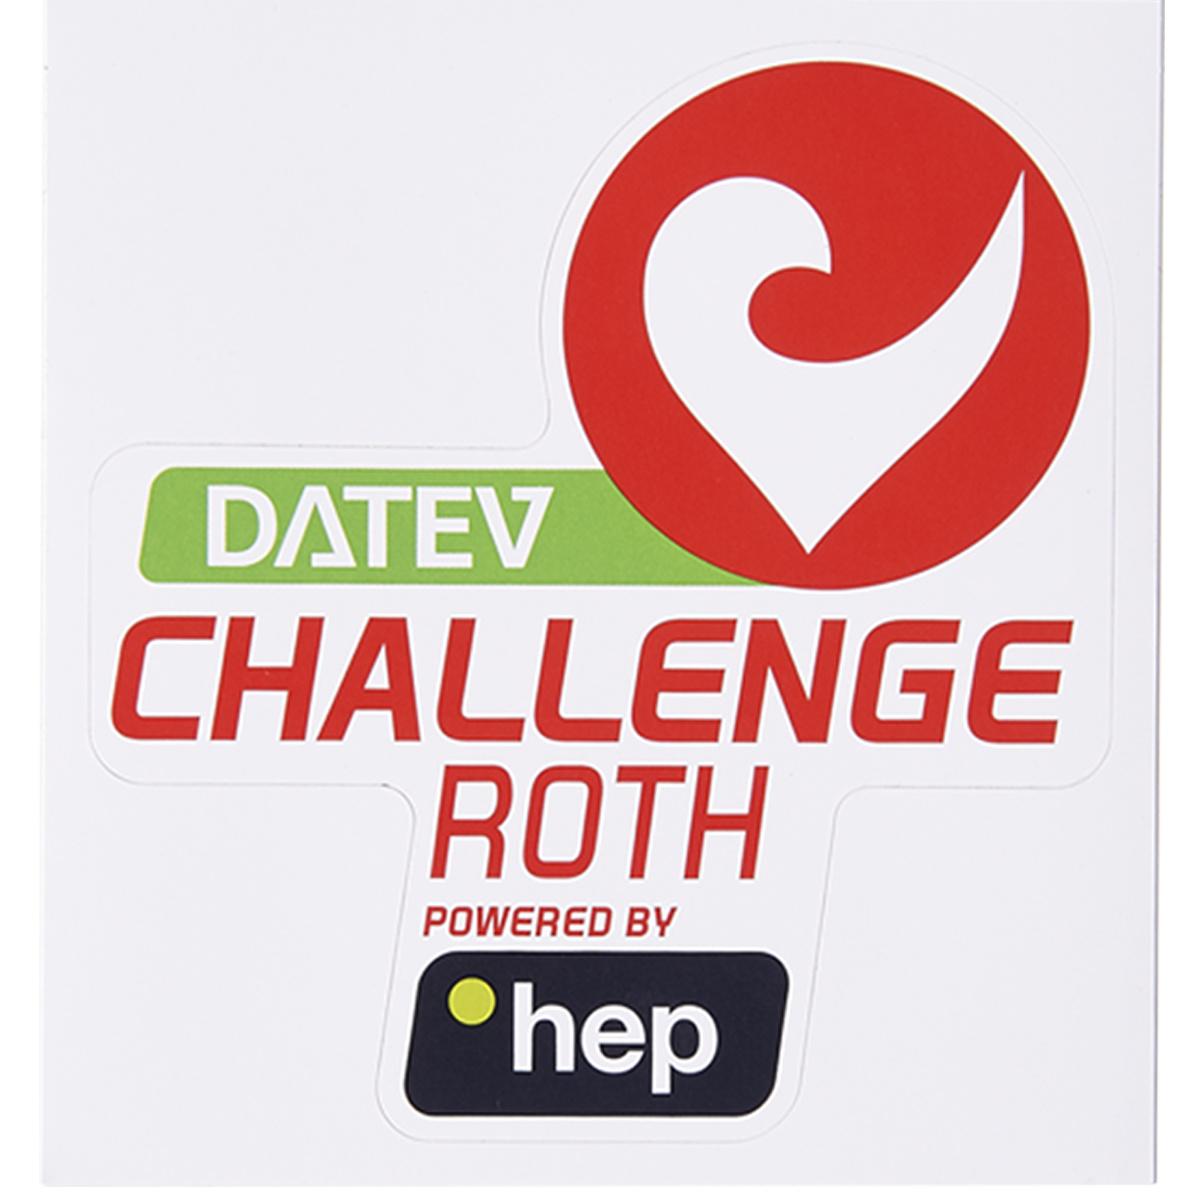 Sticker DATEV Challenge Roth powered by hep big-3